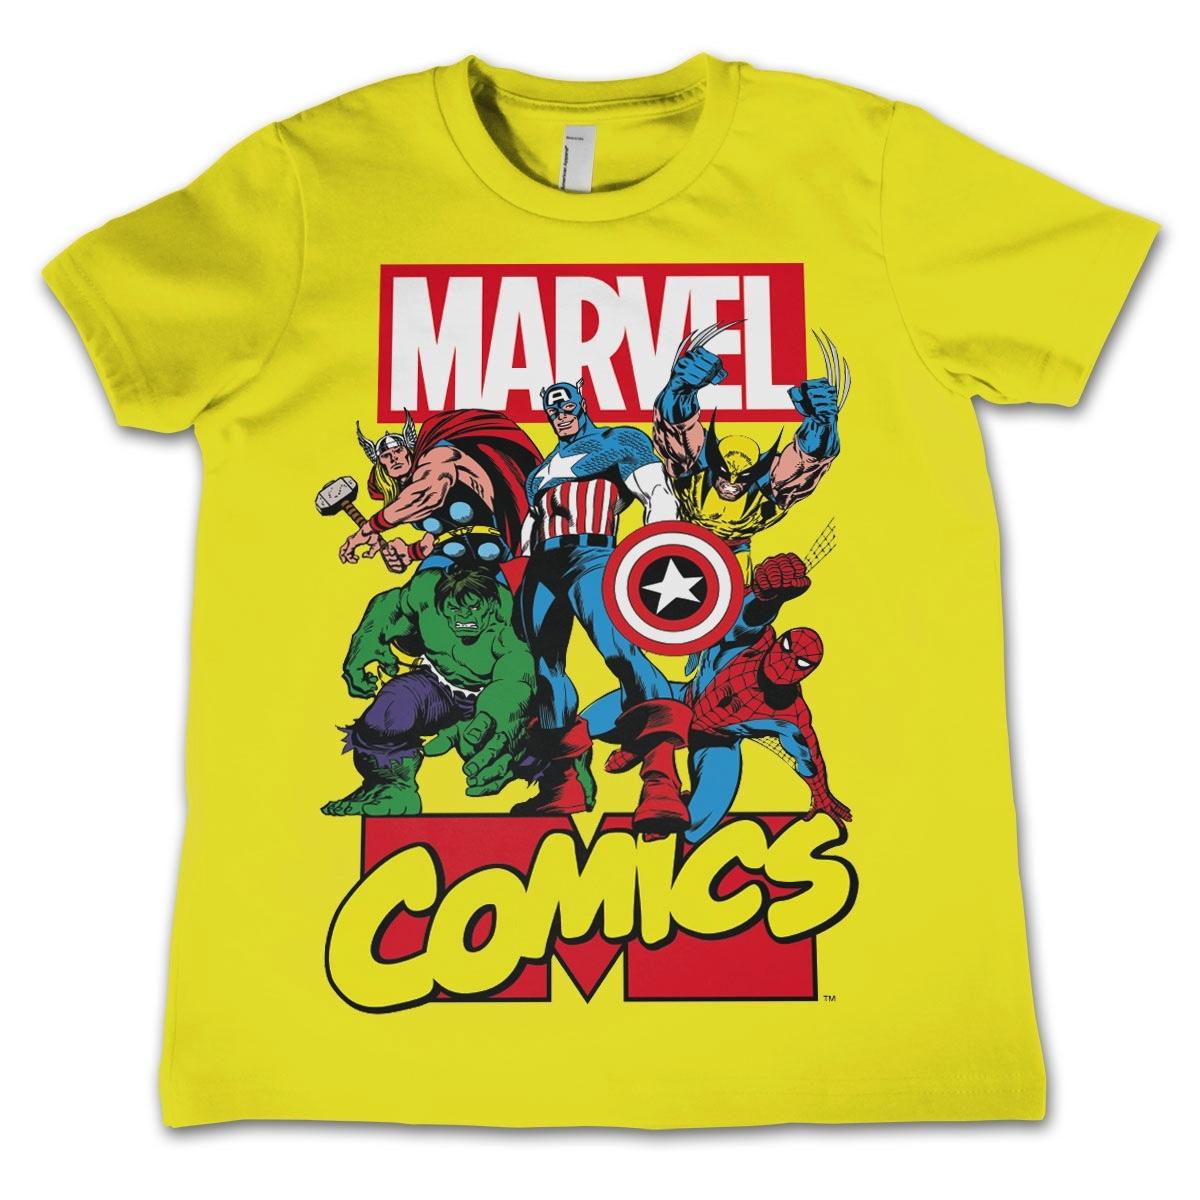 c4b5032ccabed T-Shirt enfant Marvel : Comics Heroe Jaune - 12 ans : Référence Gaming